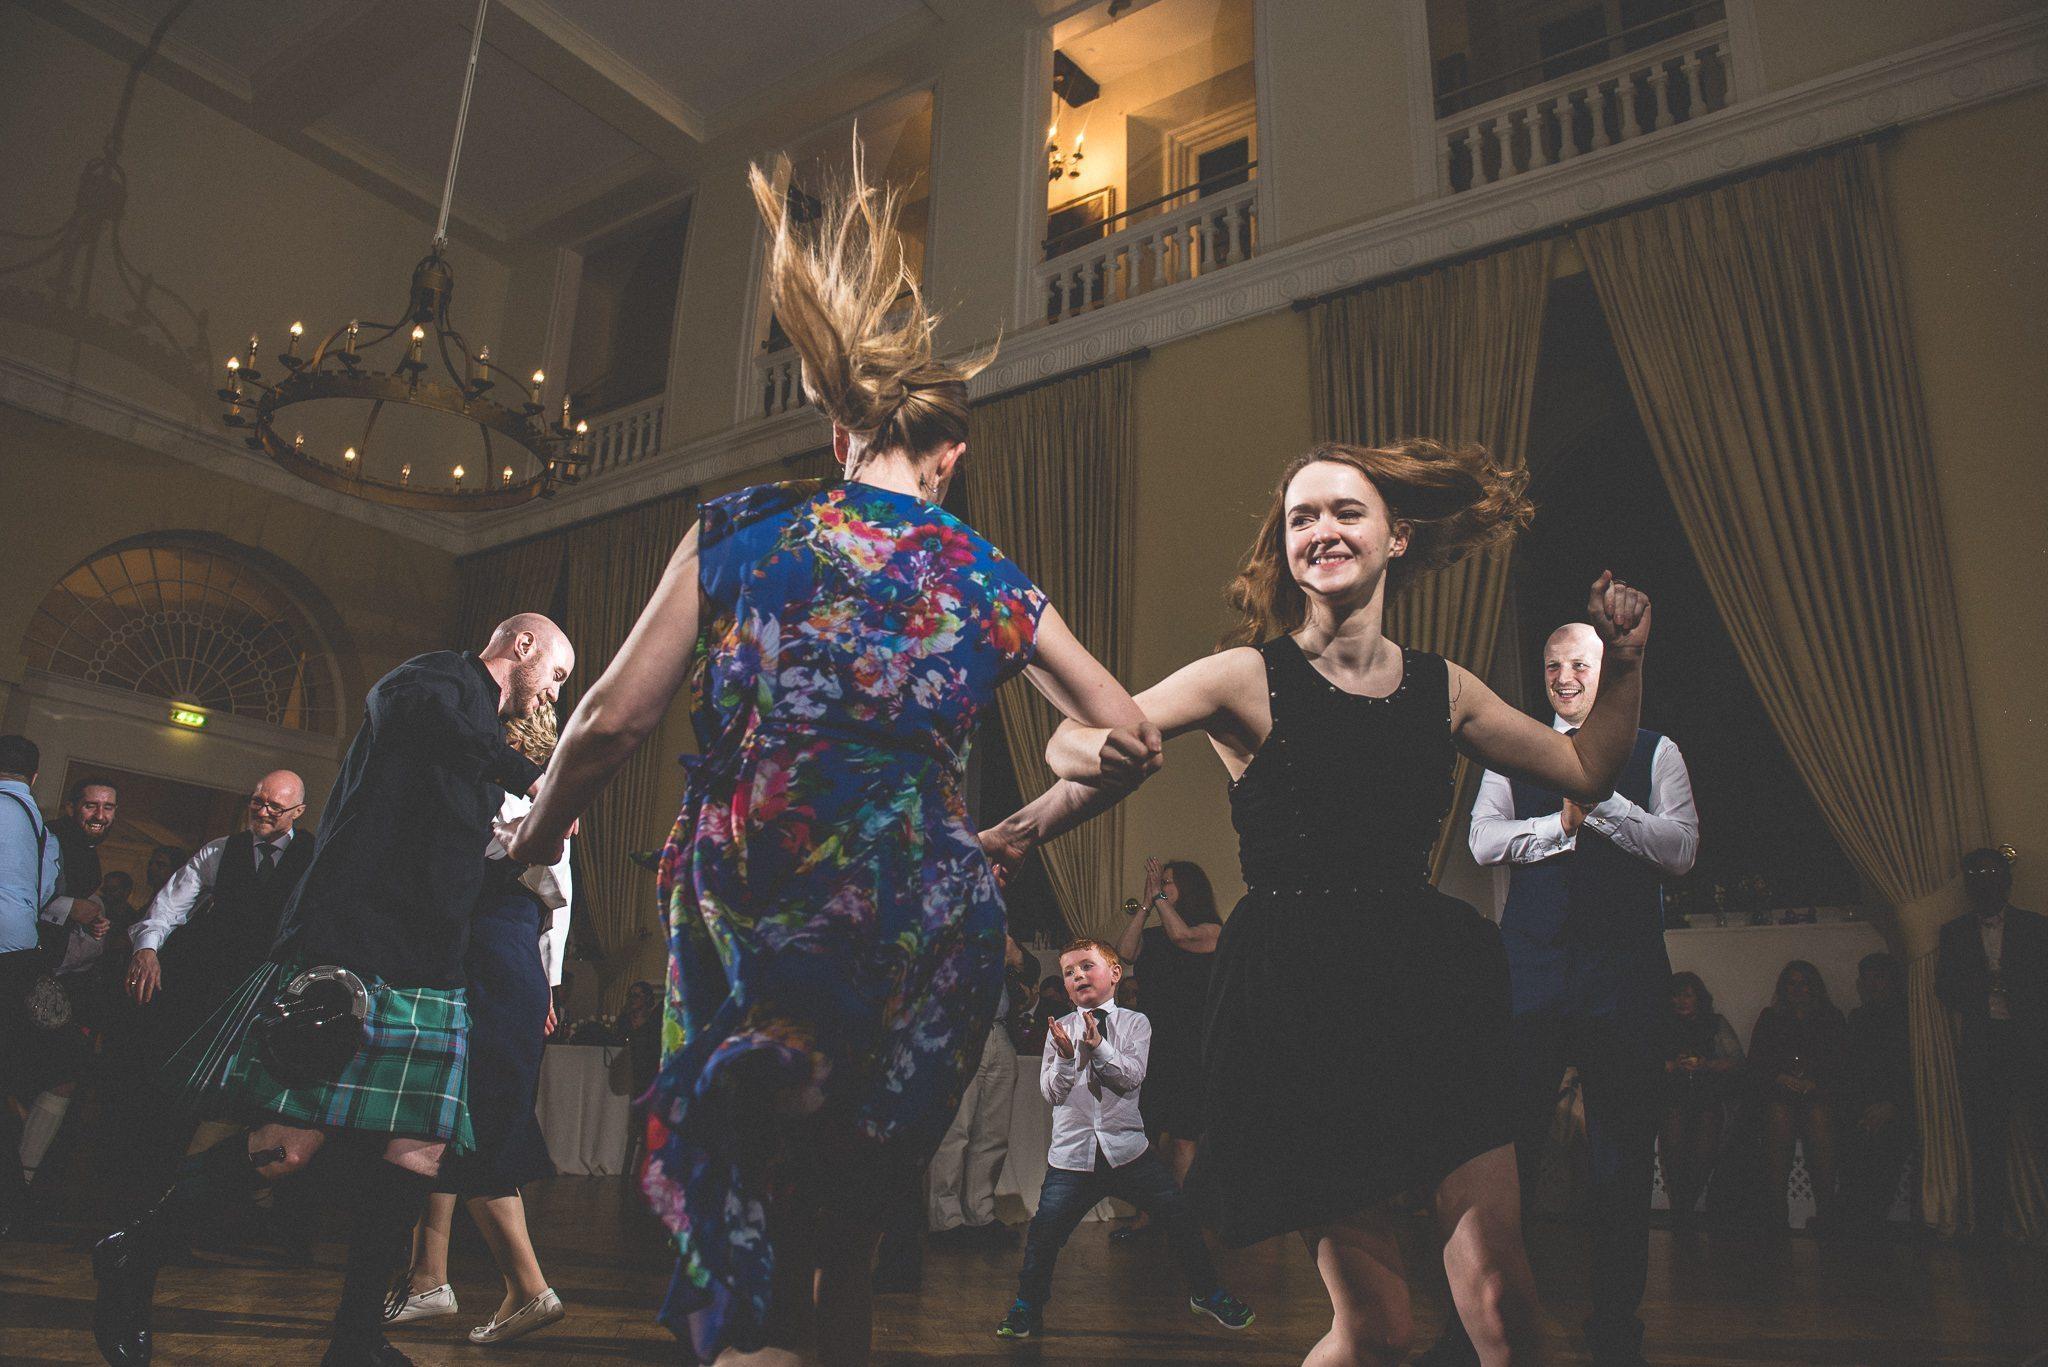 Guests dancing ceilidhs at a fun Farnham Castle wedding